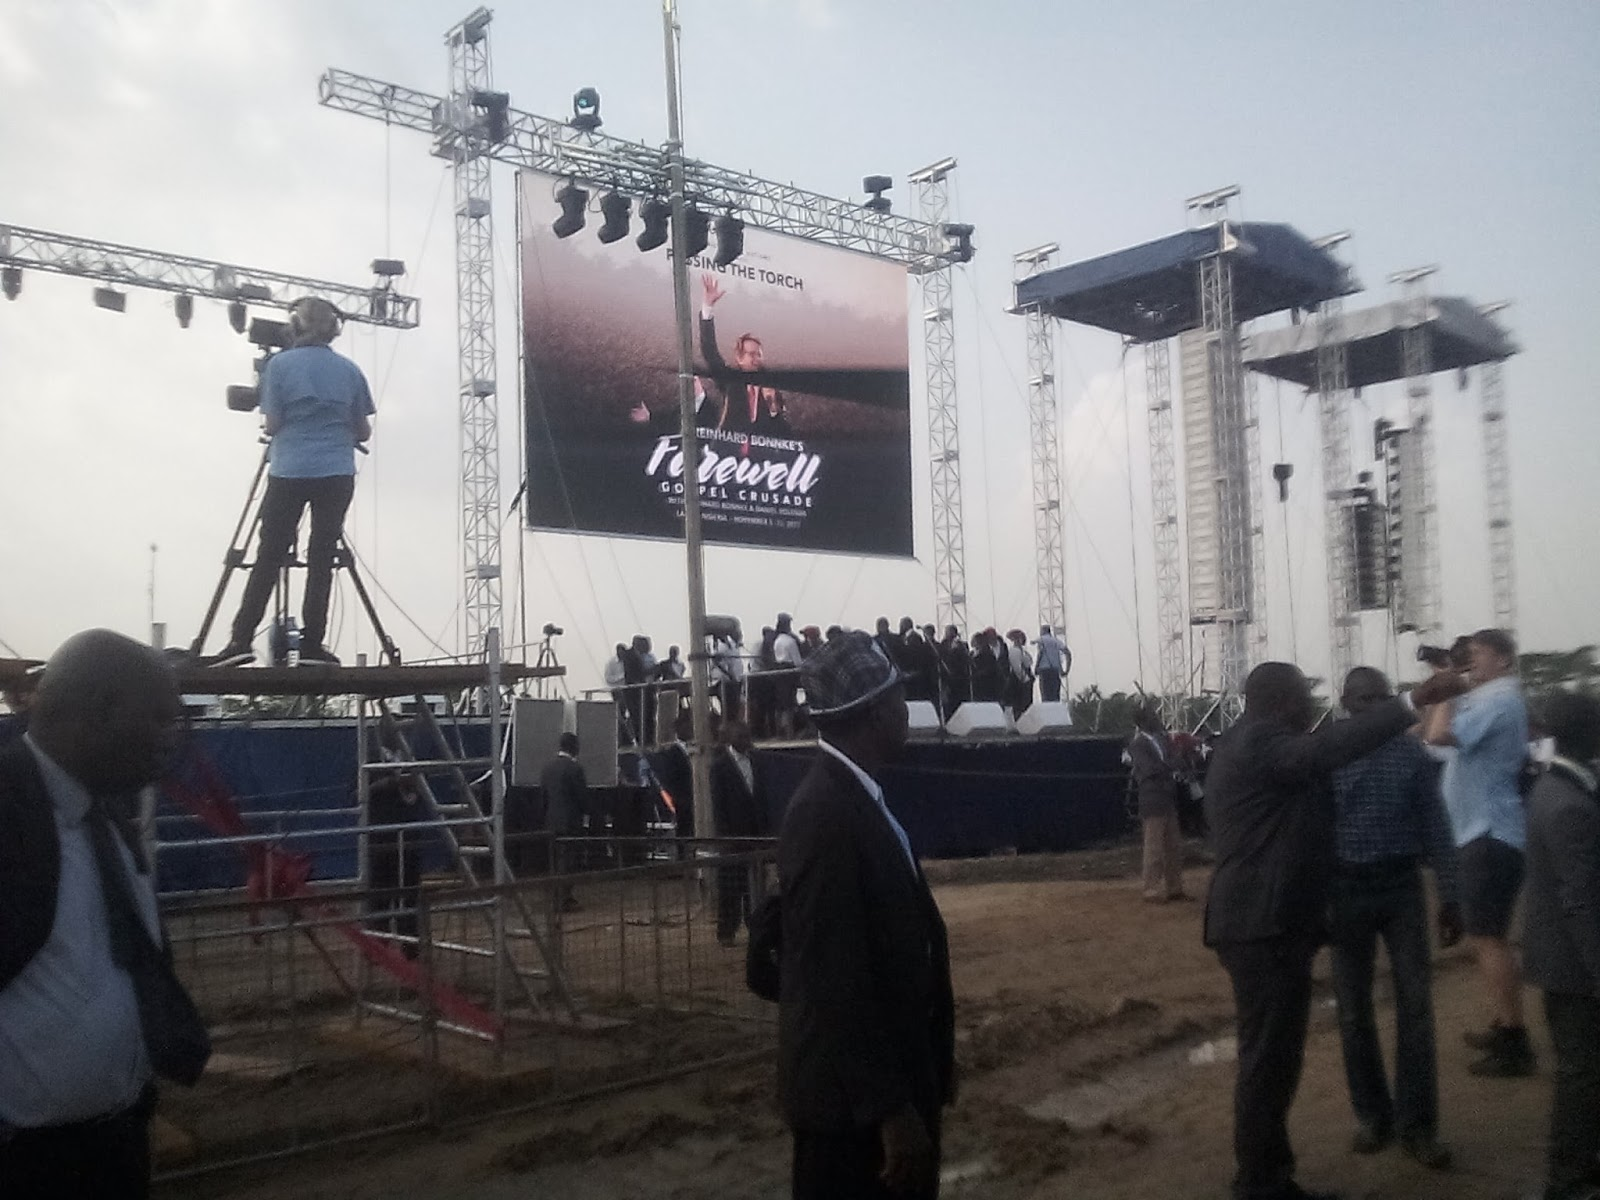 Pictures Reinhard Bonnke's Farewell Lagos Crusade